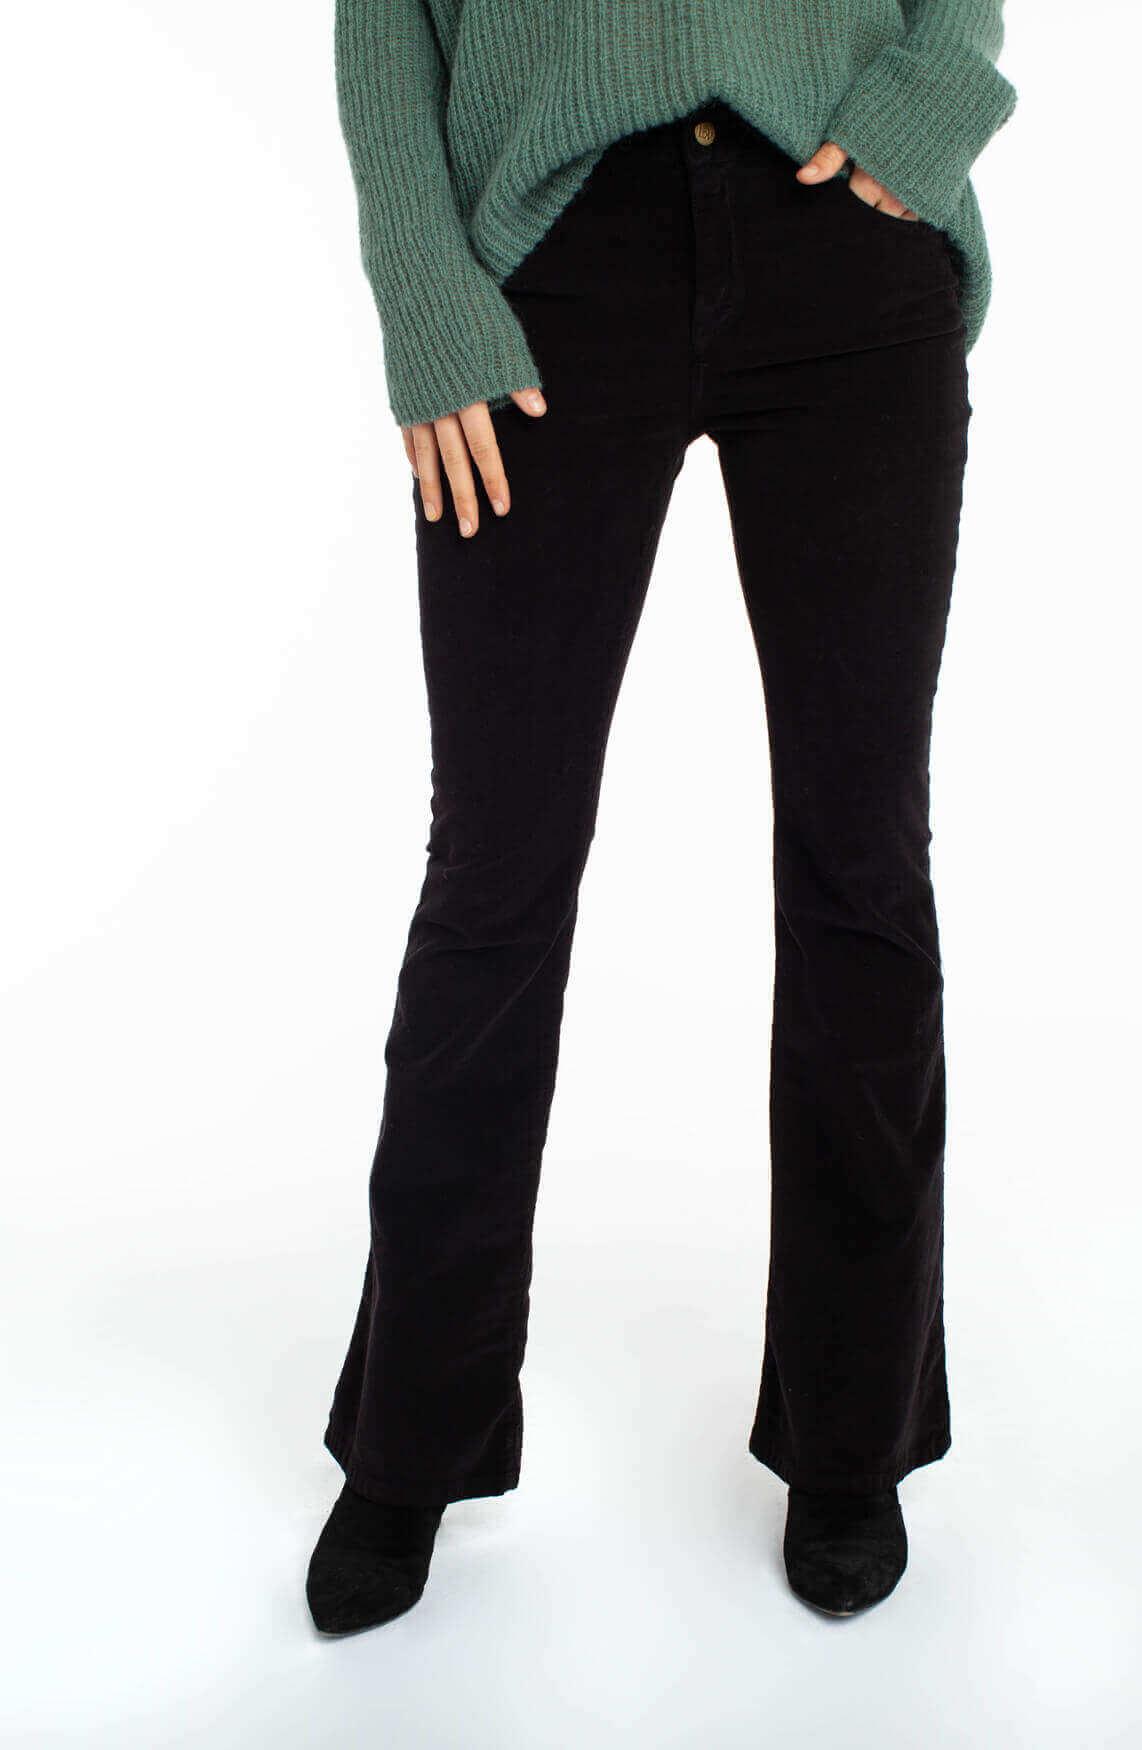 Lois Dames Micro Beat flared jeans L32 zwart